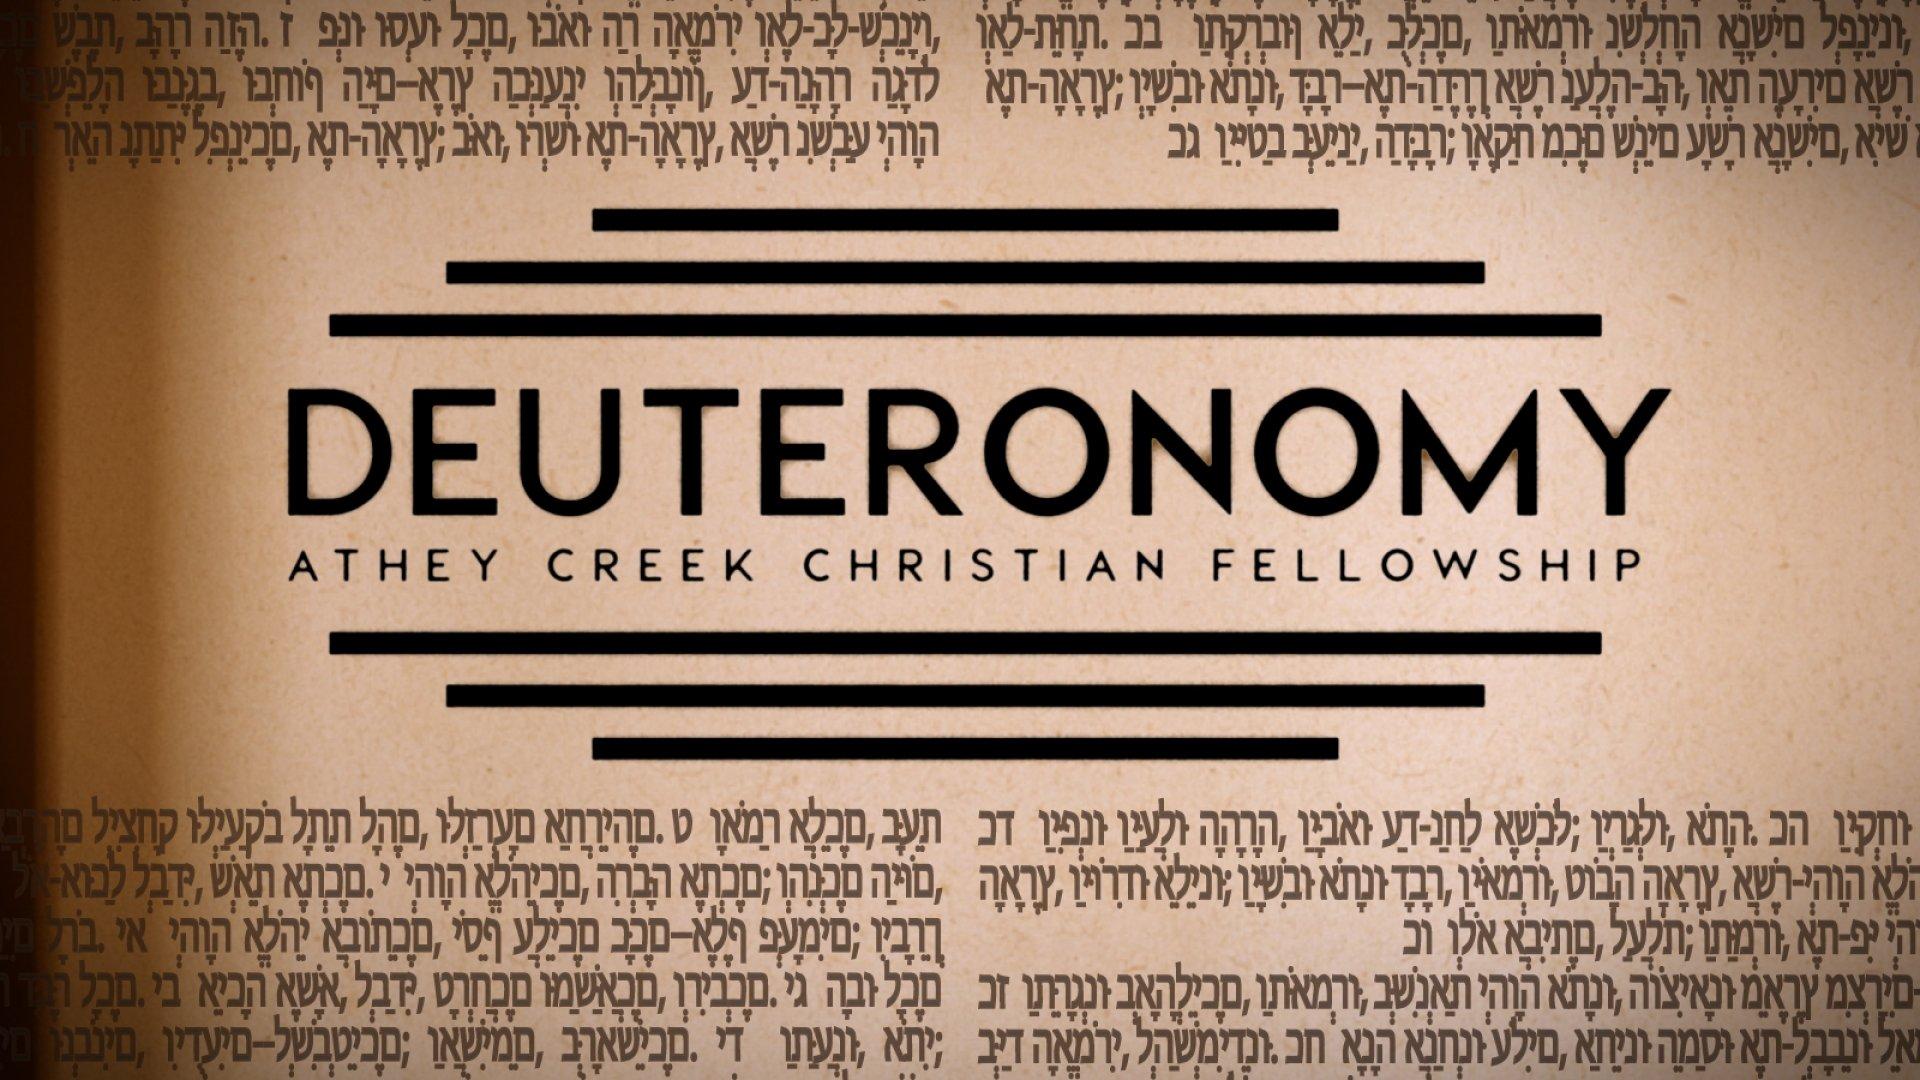 Teaching artwork for Deuteronomy